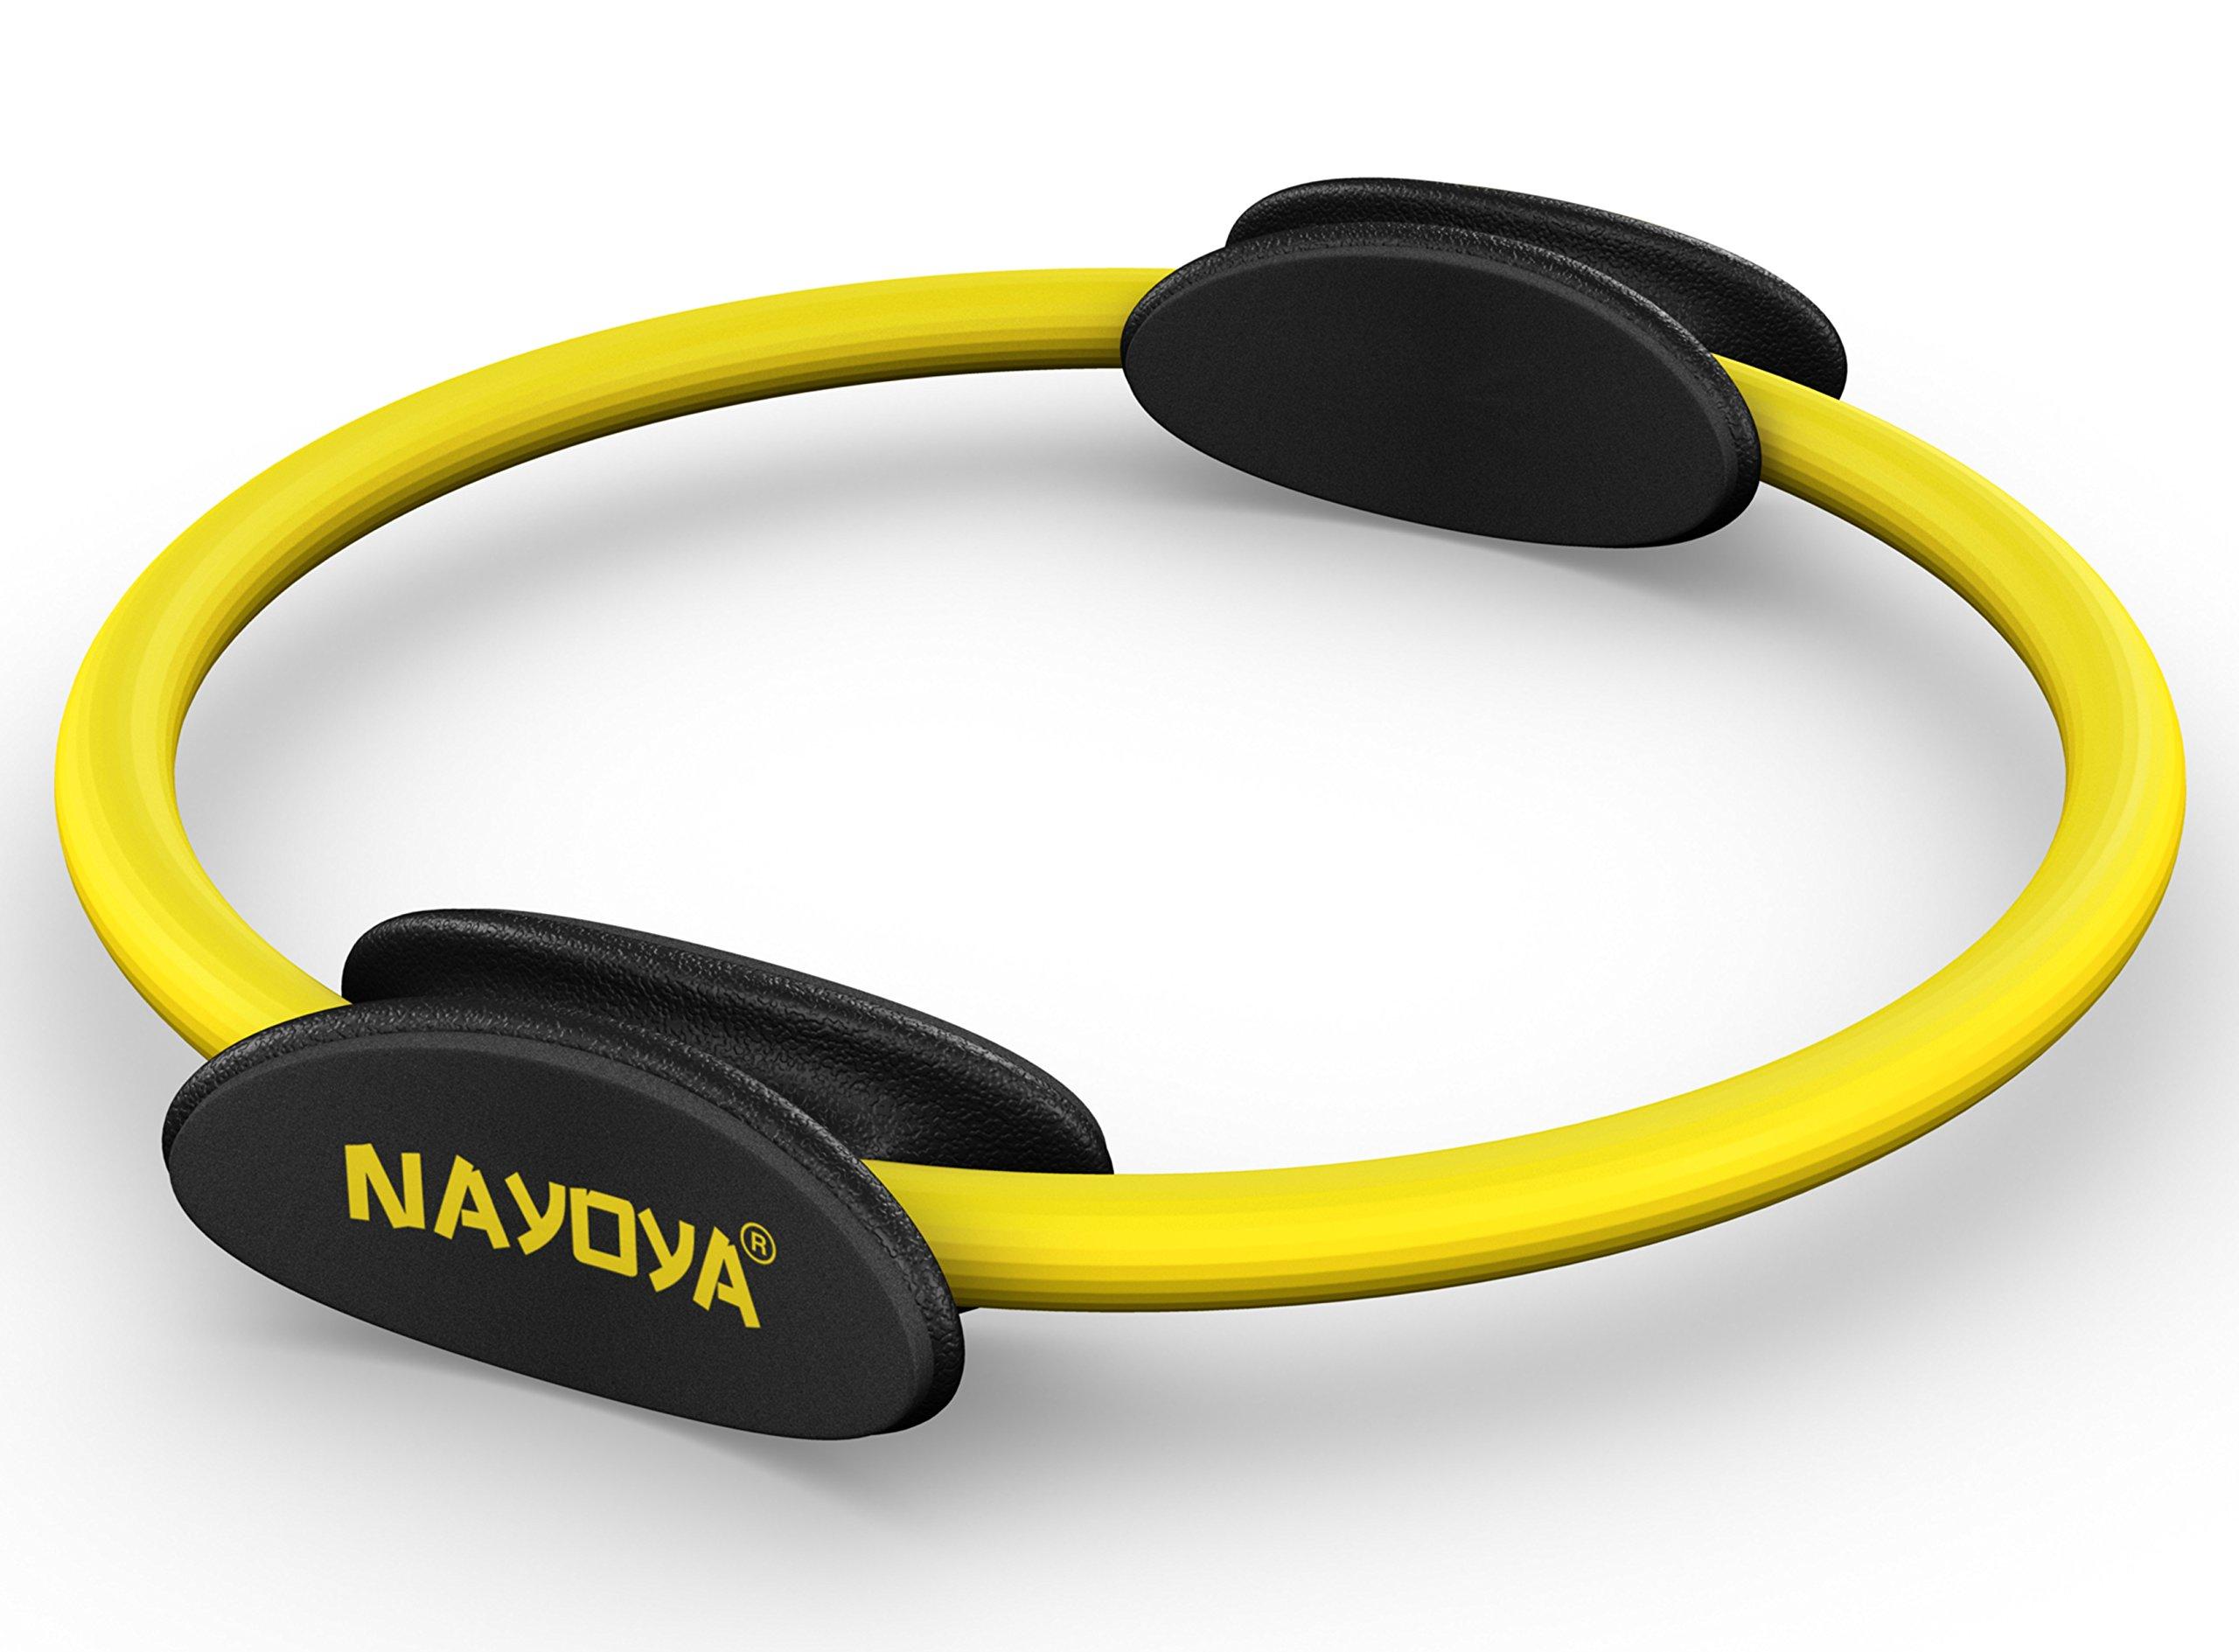 NAYOYA Pilates Ring – Premium Full Body Toning Fitness Magic Circle for at Home Body Sculpt Resistance Training- Leg…